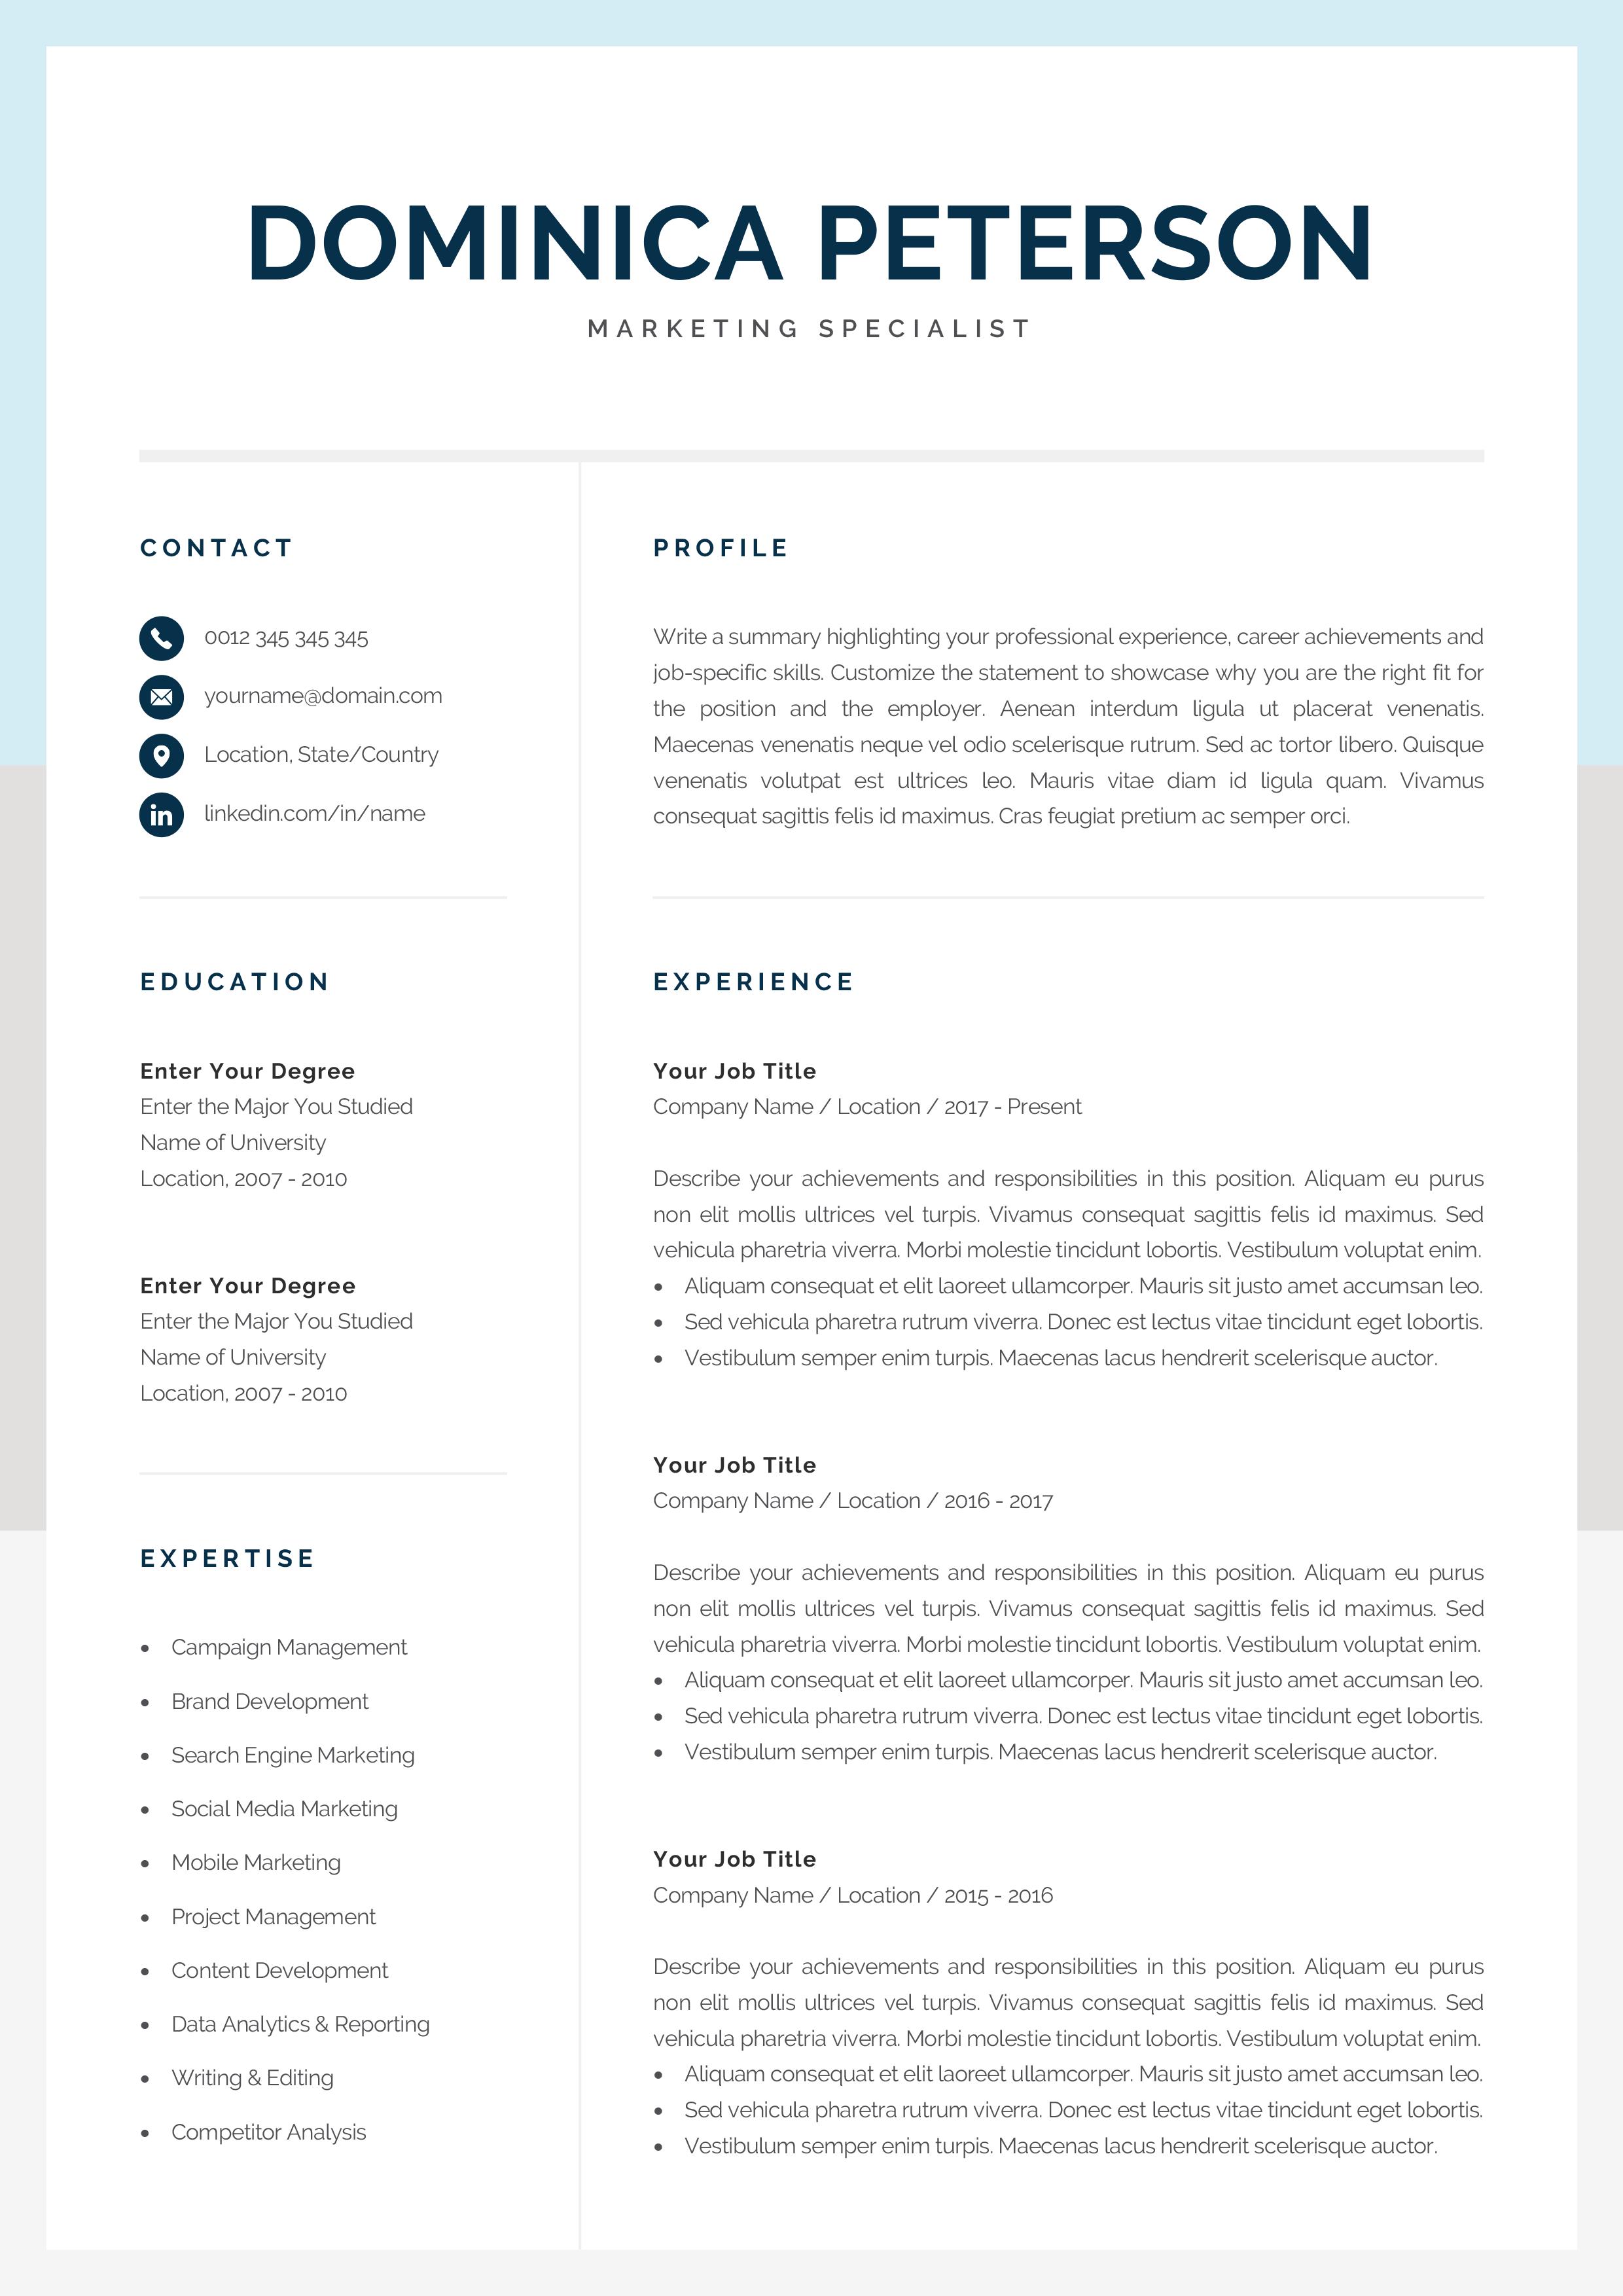 Modern Resume Template Creative Cv Design 1 2 Page Etsy In 2020 Modern Resume Template Resume Template Creative Resume Templates